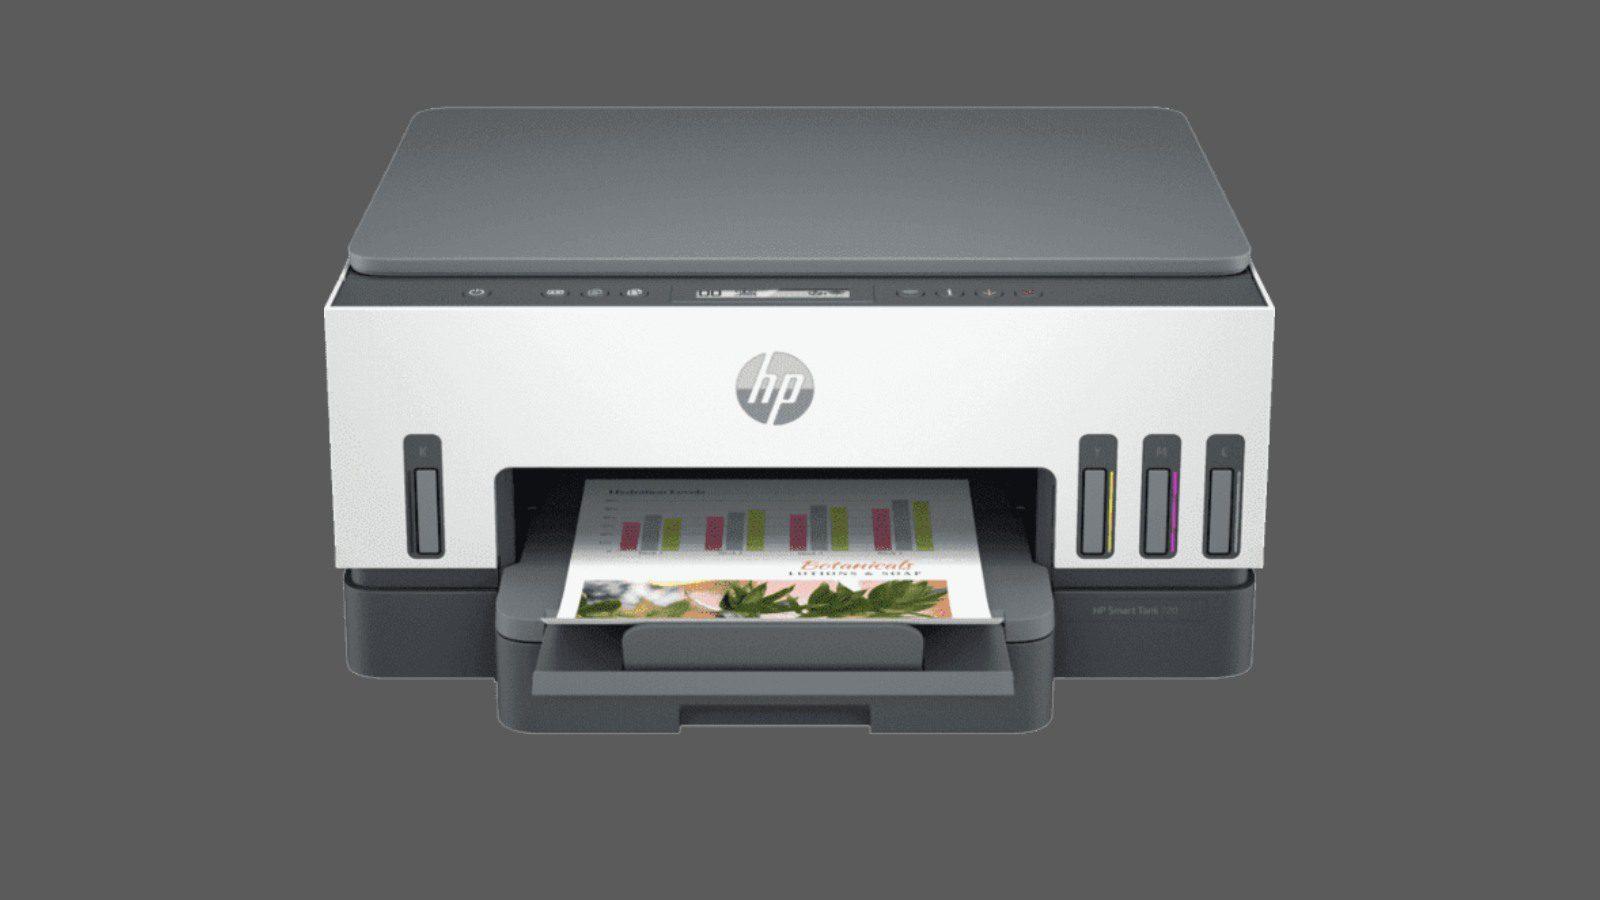 HP smart tank printer